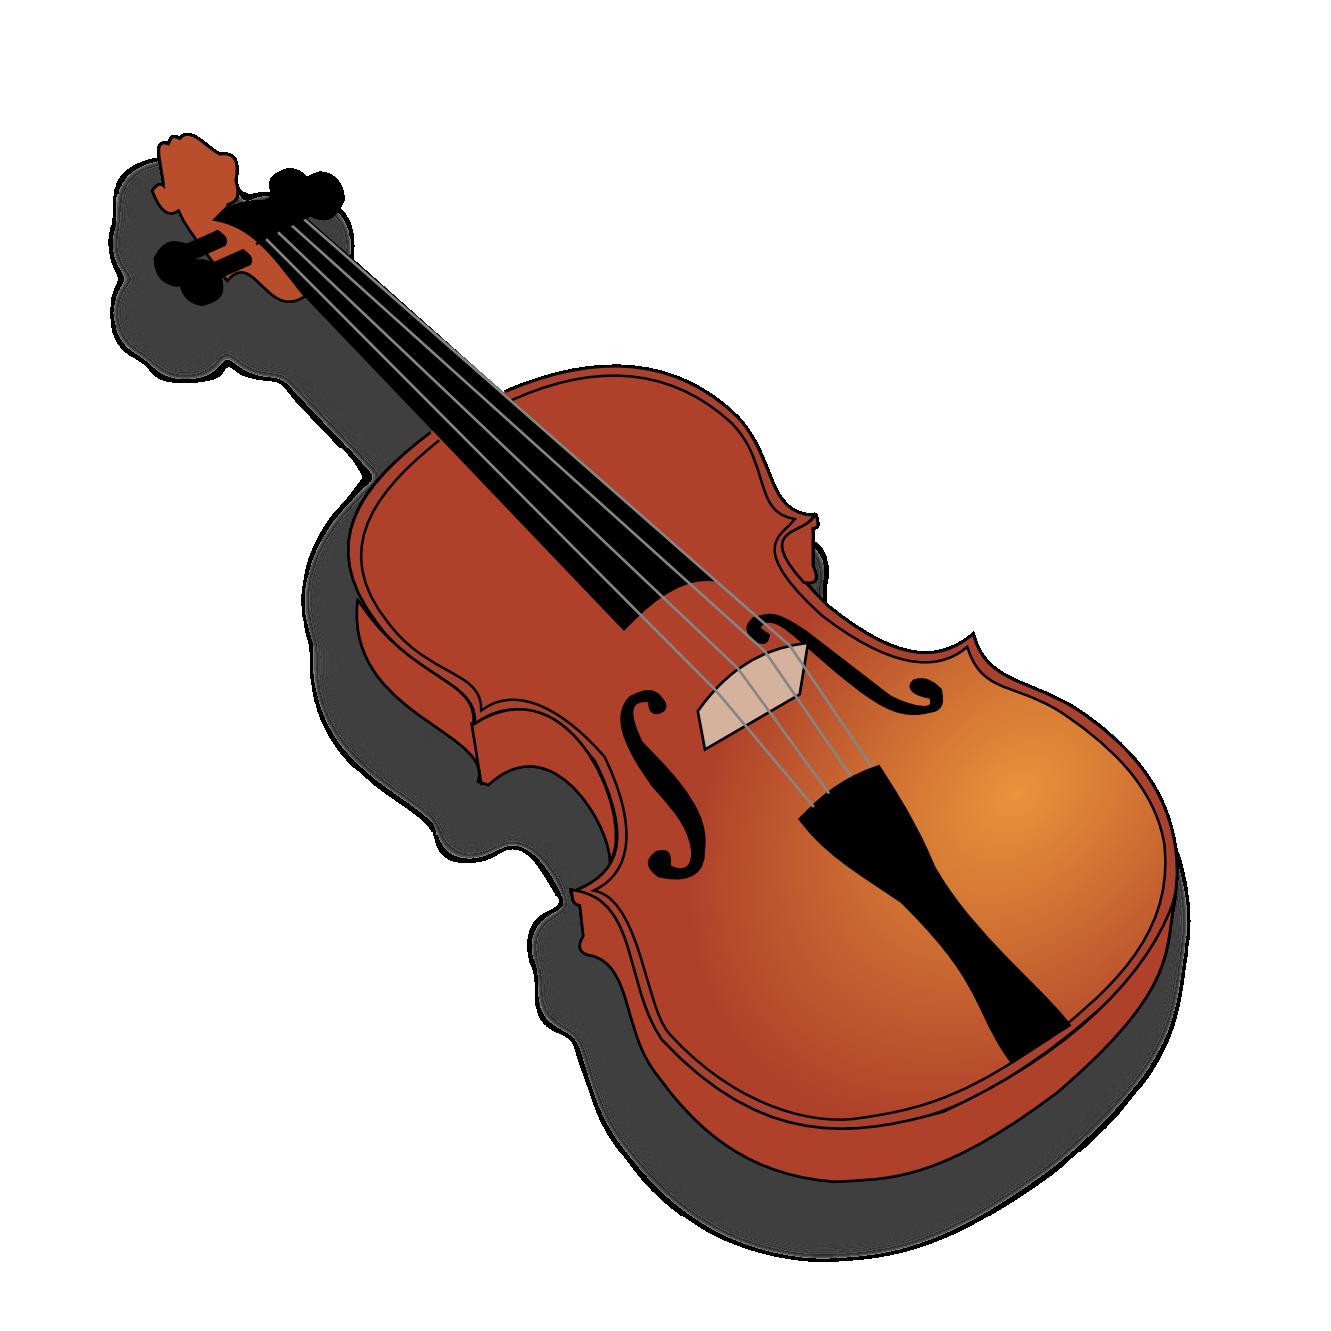 violin clipart clipart panda free clipart images violin clip art vintage violin clipart transparent